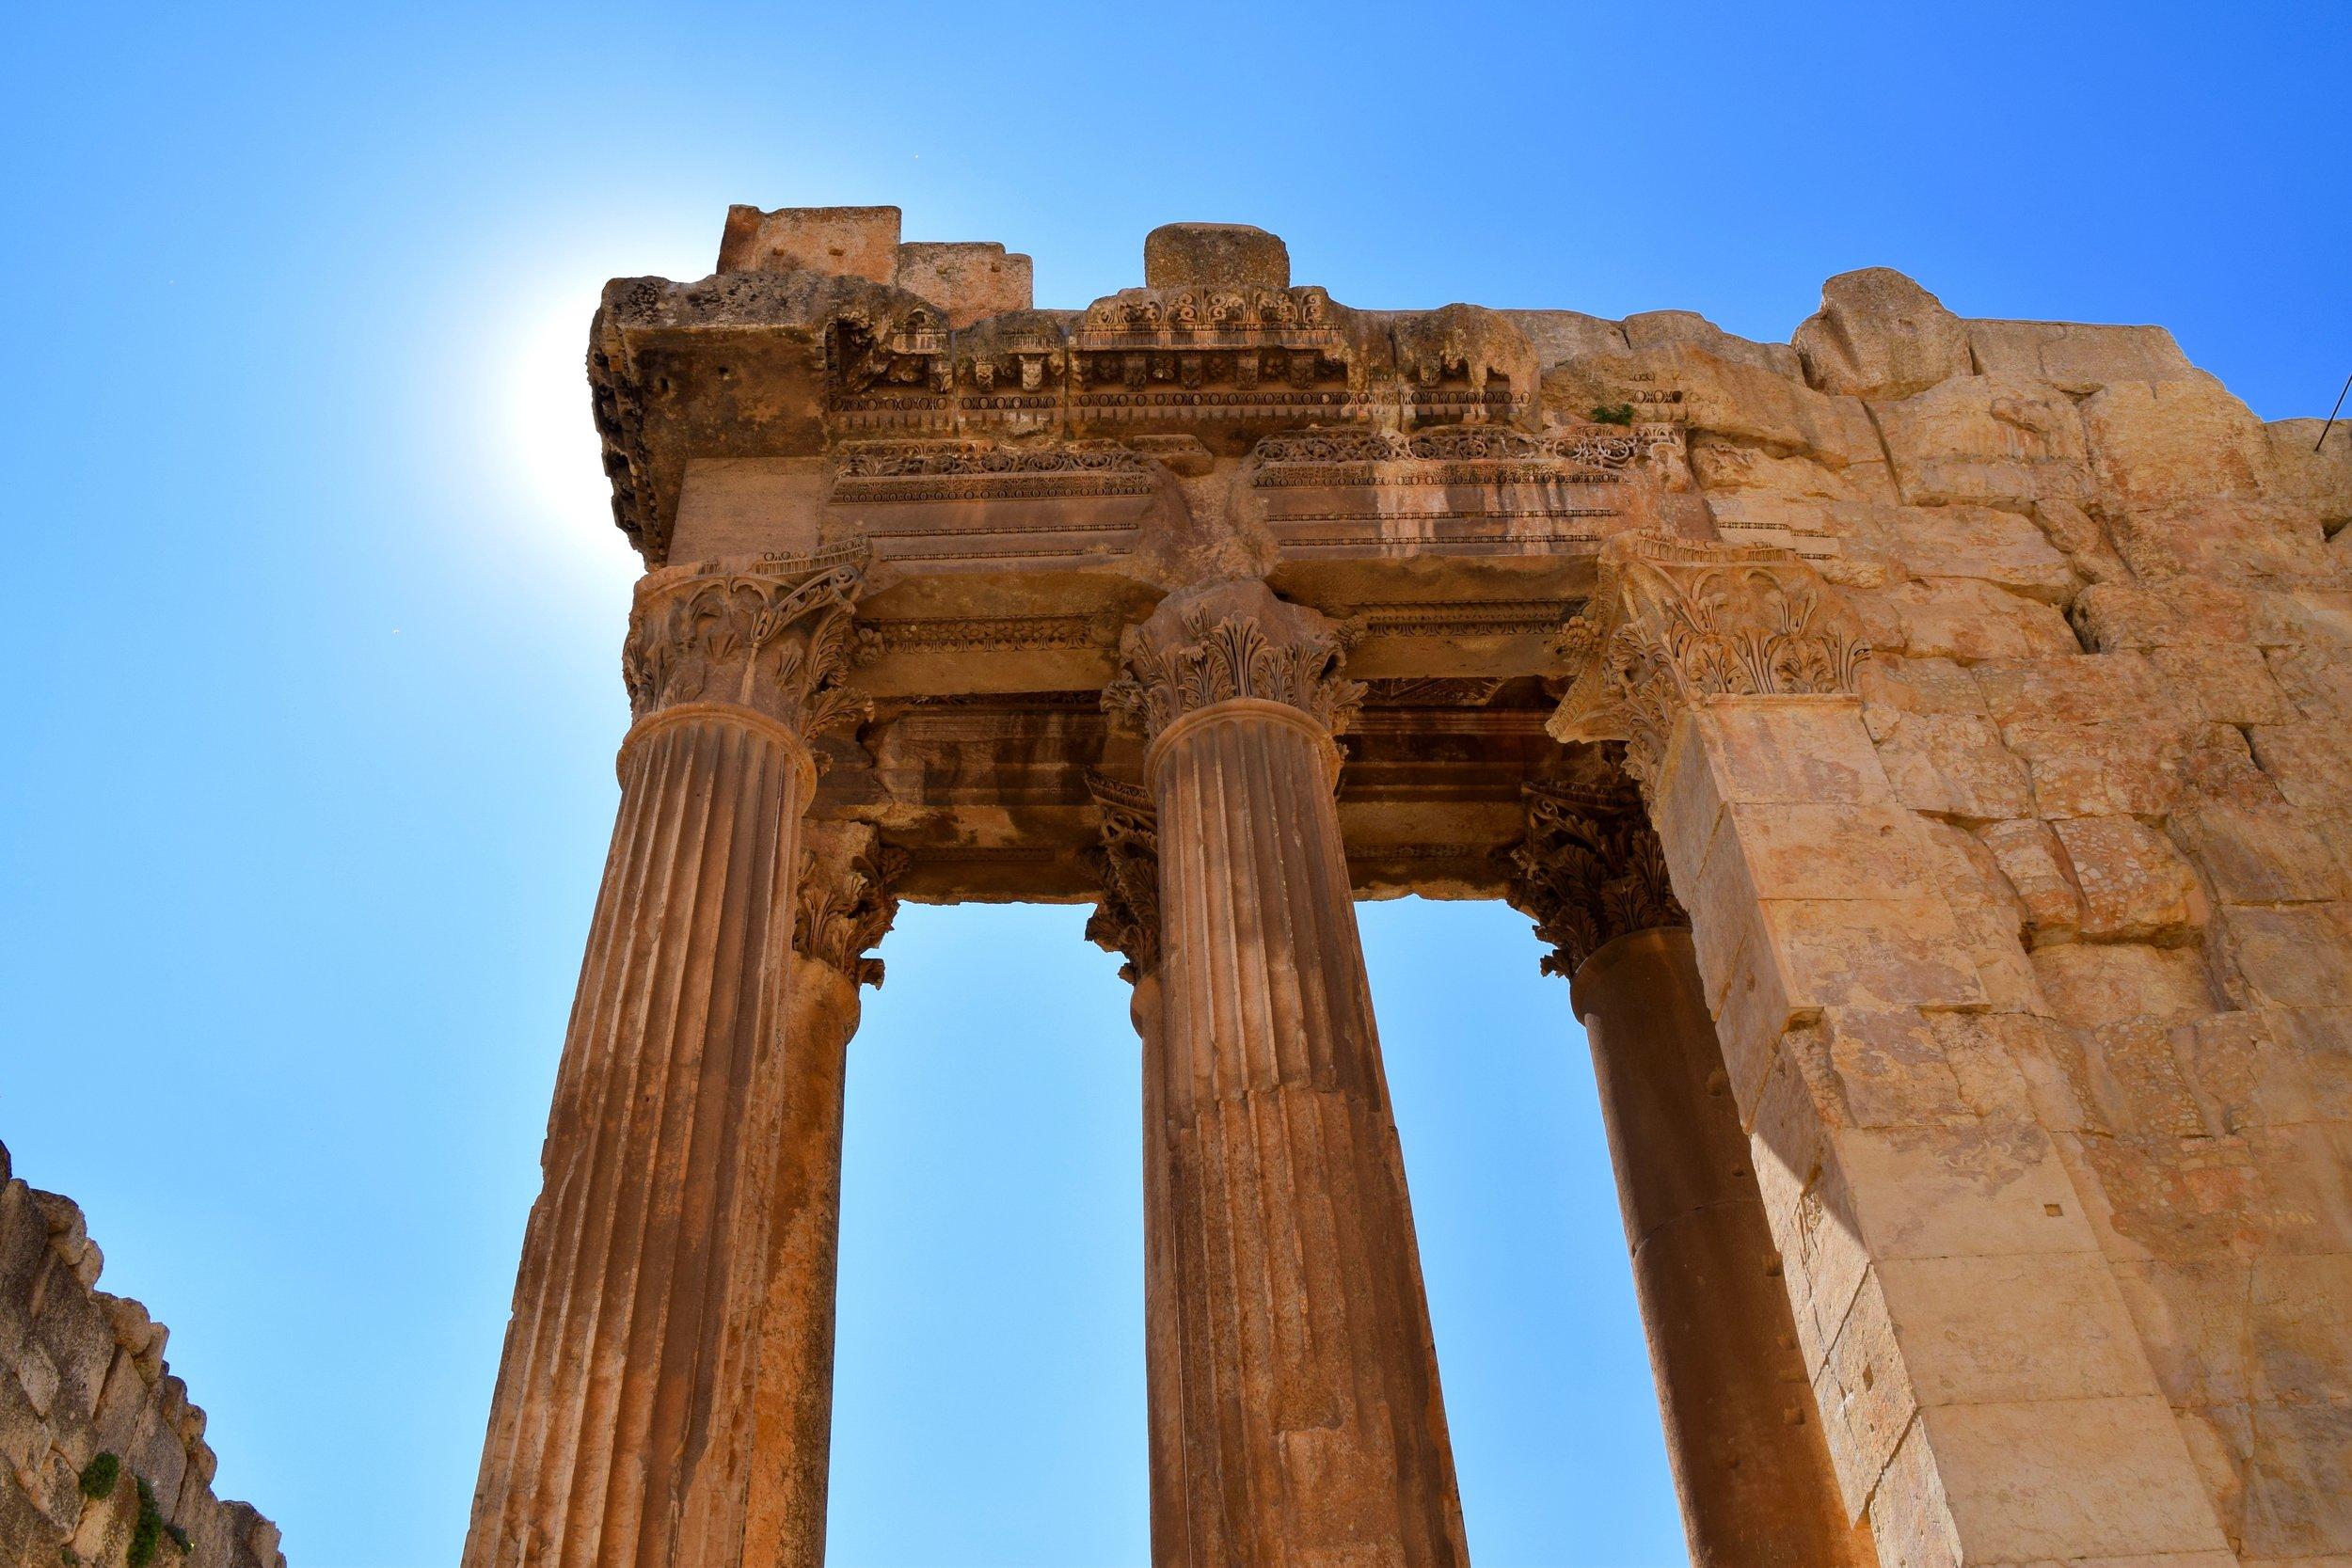 Columns of a Roman temple, Baalbek